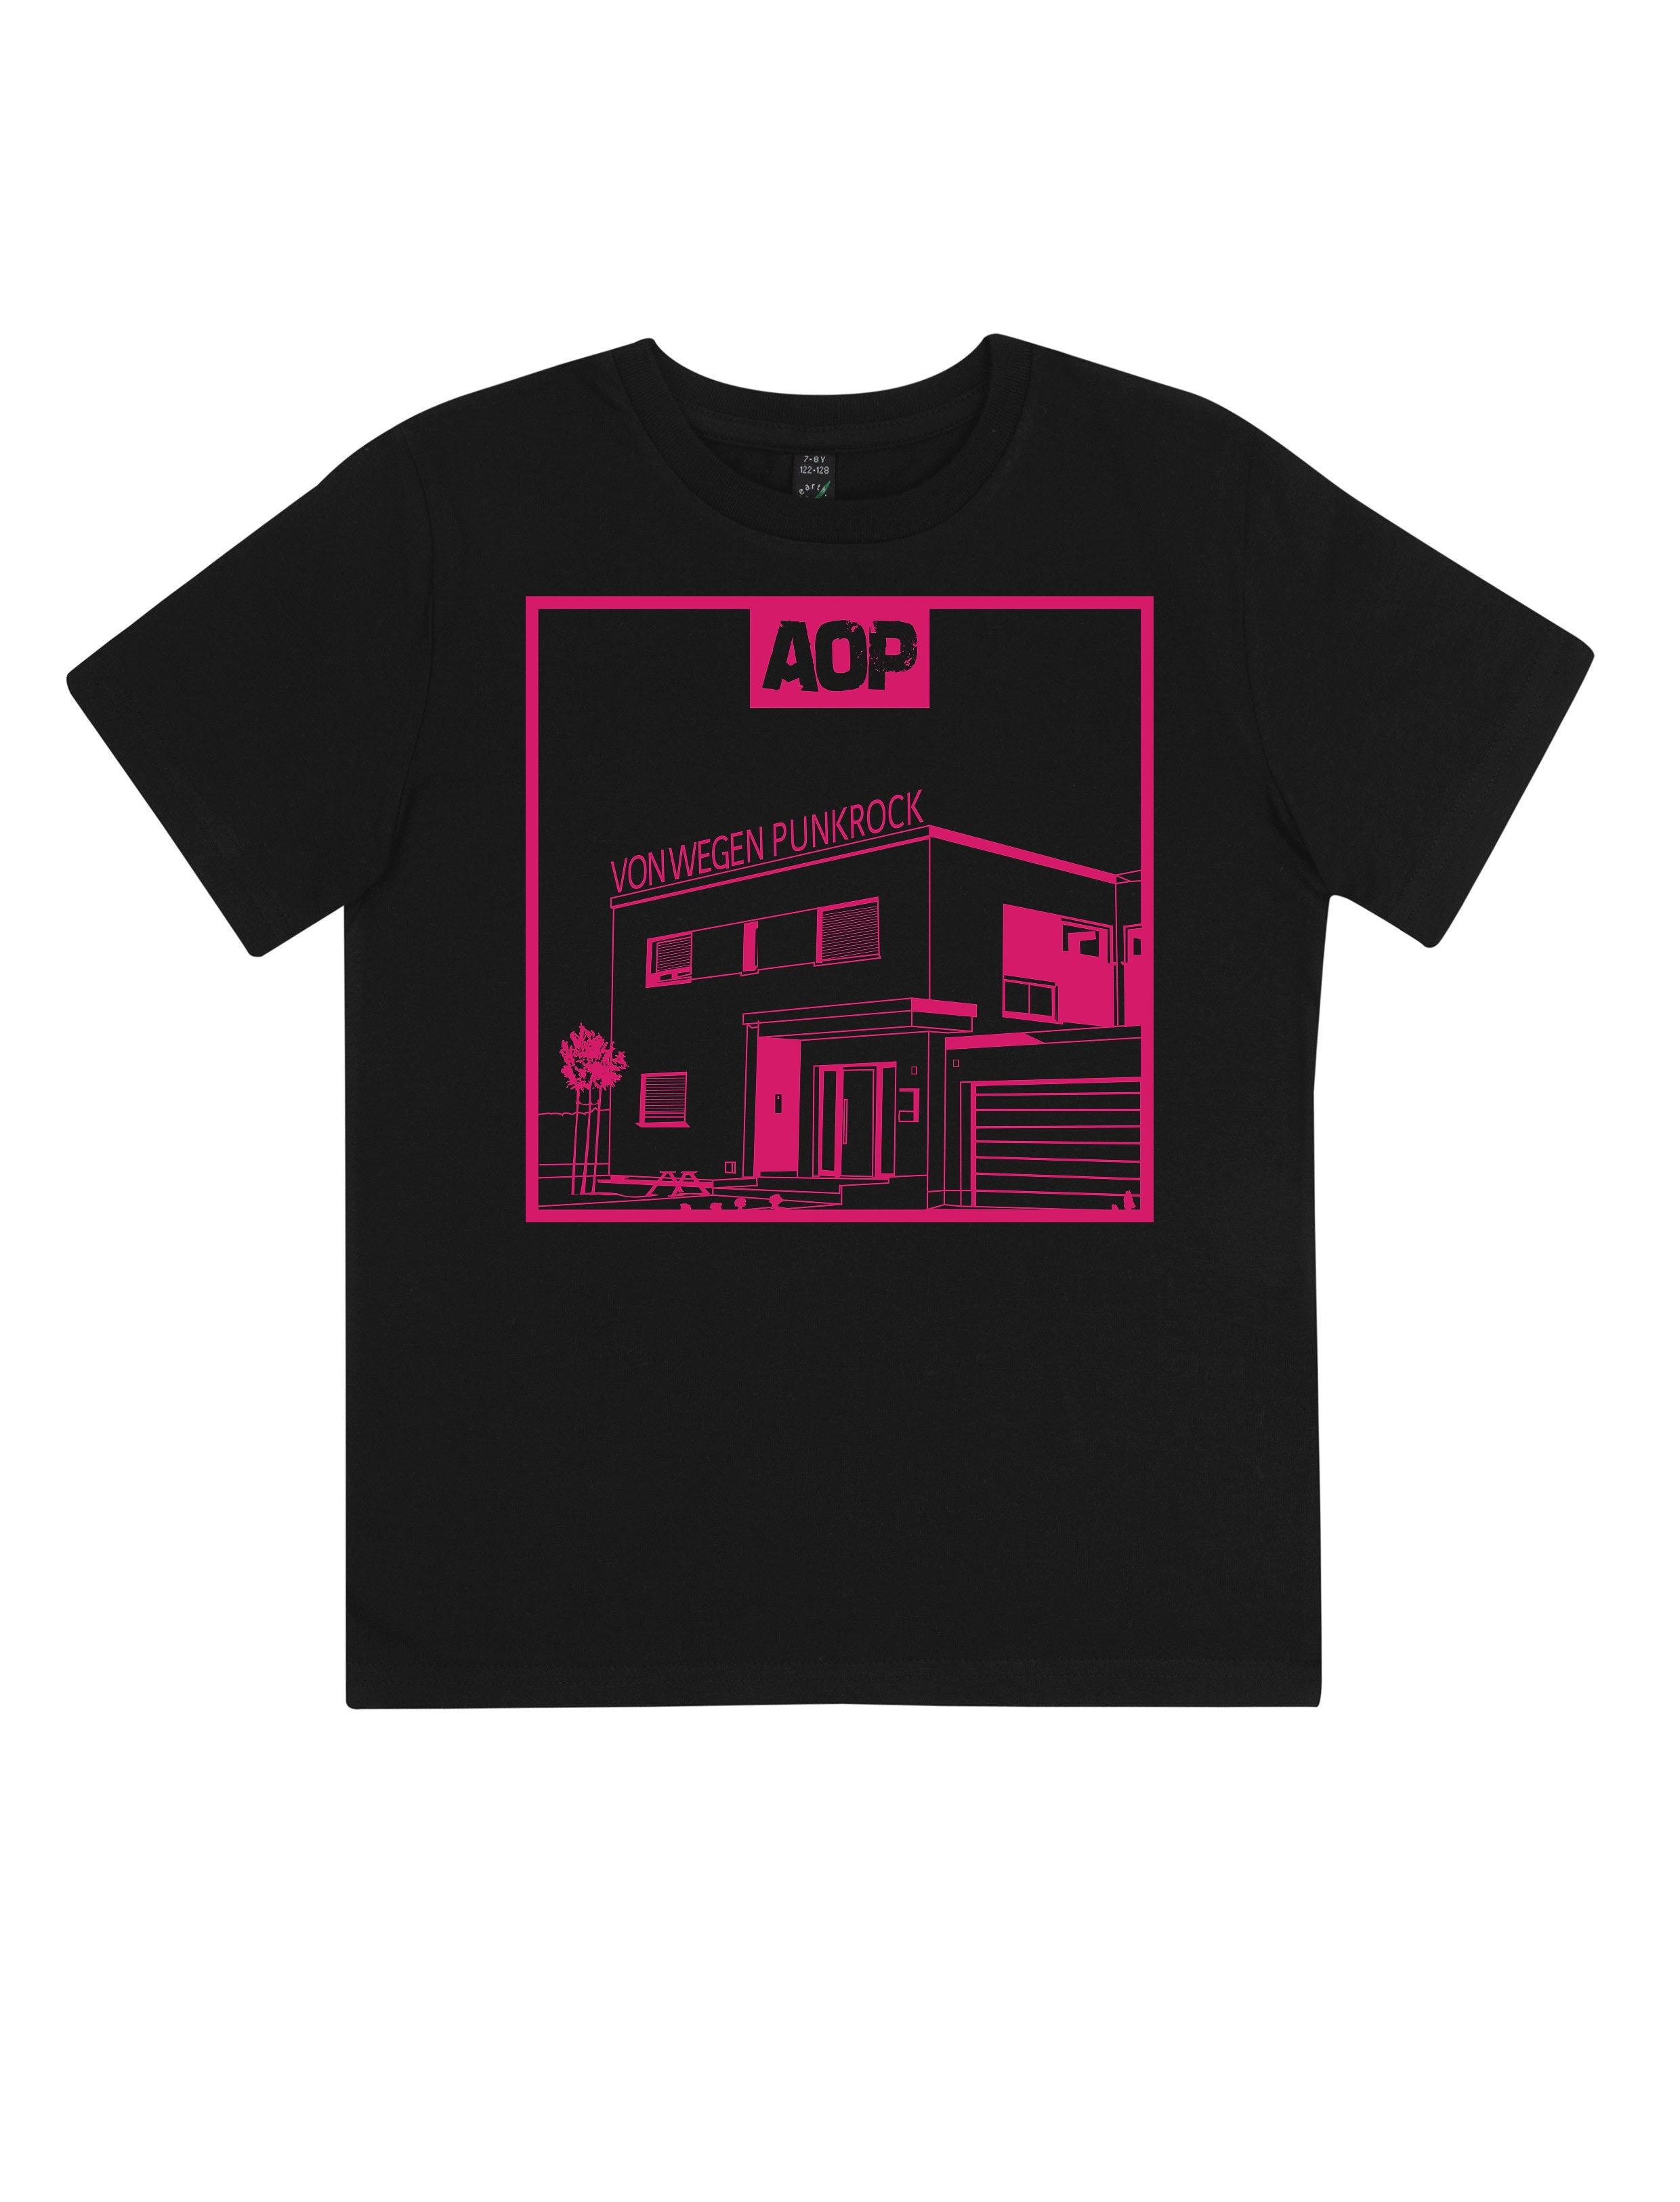 AOP – Von wegen Punkrock – Kids-Shirt (schwarz)